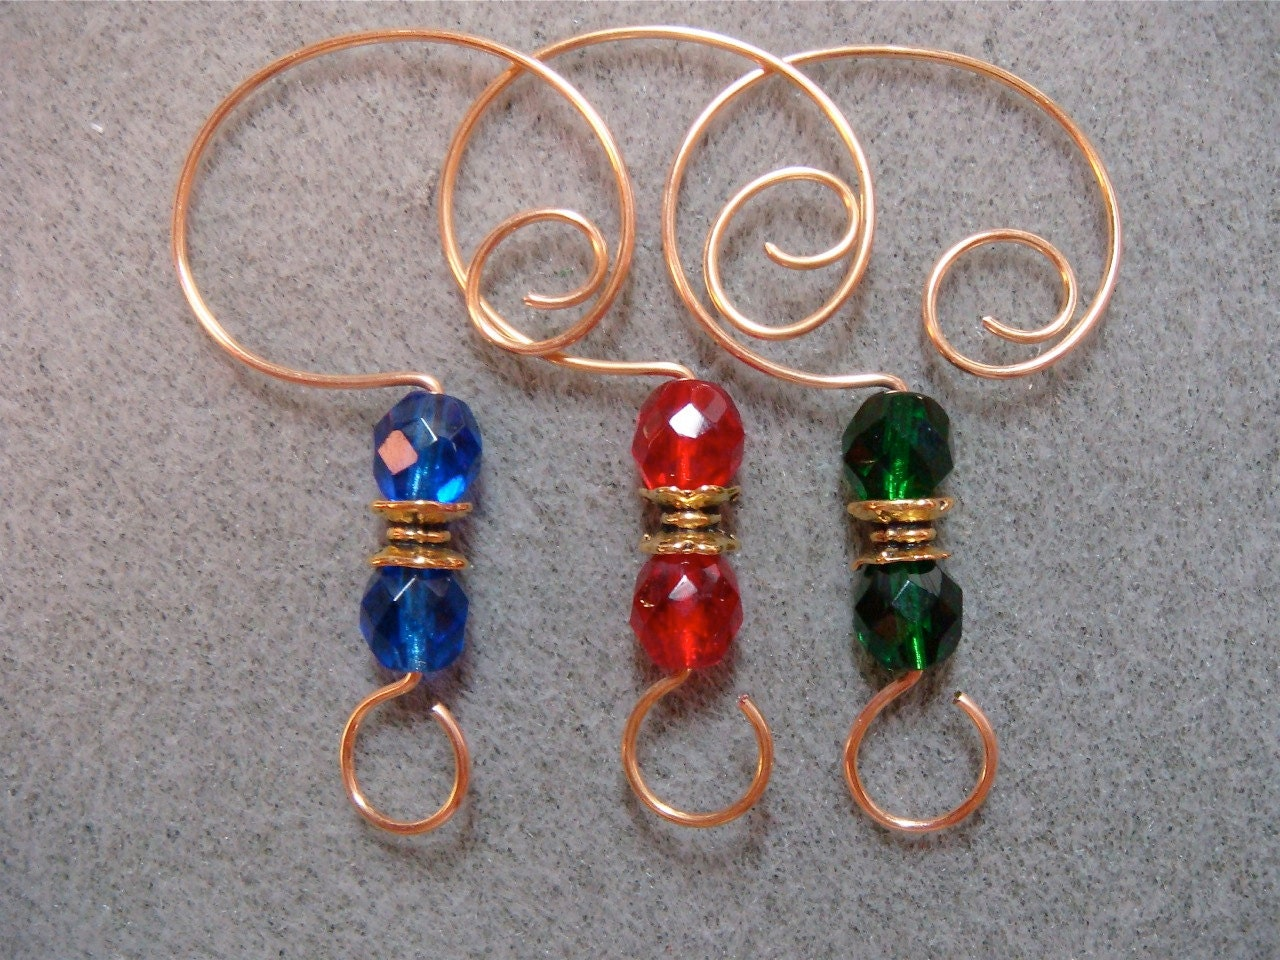 12 Ornament Hooks Hangers Enhancers for your Christmas